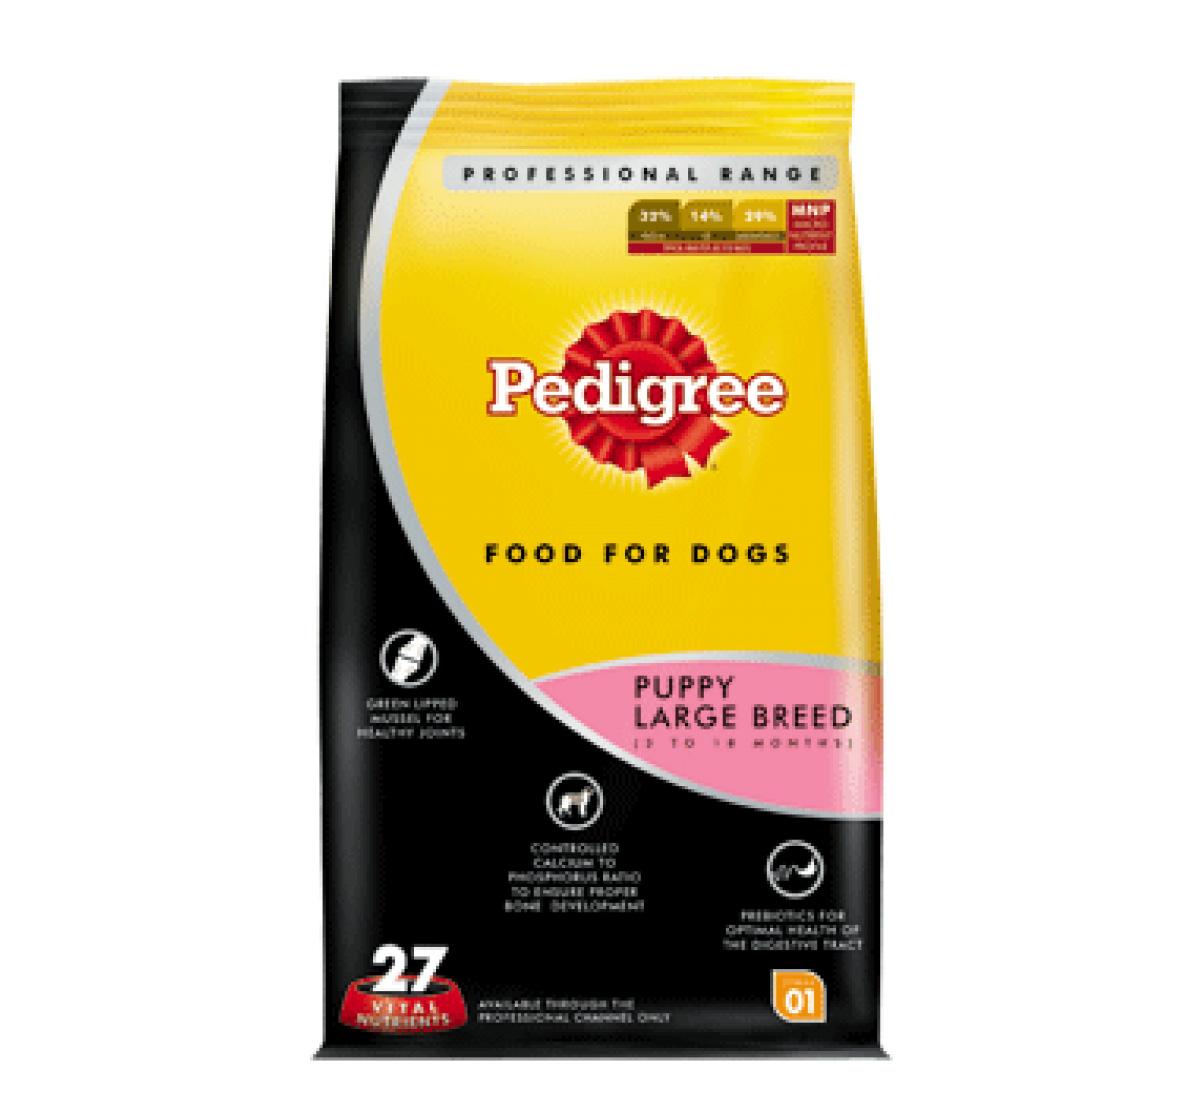 Pedigree Dog Food Puppy Large Breed Professional